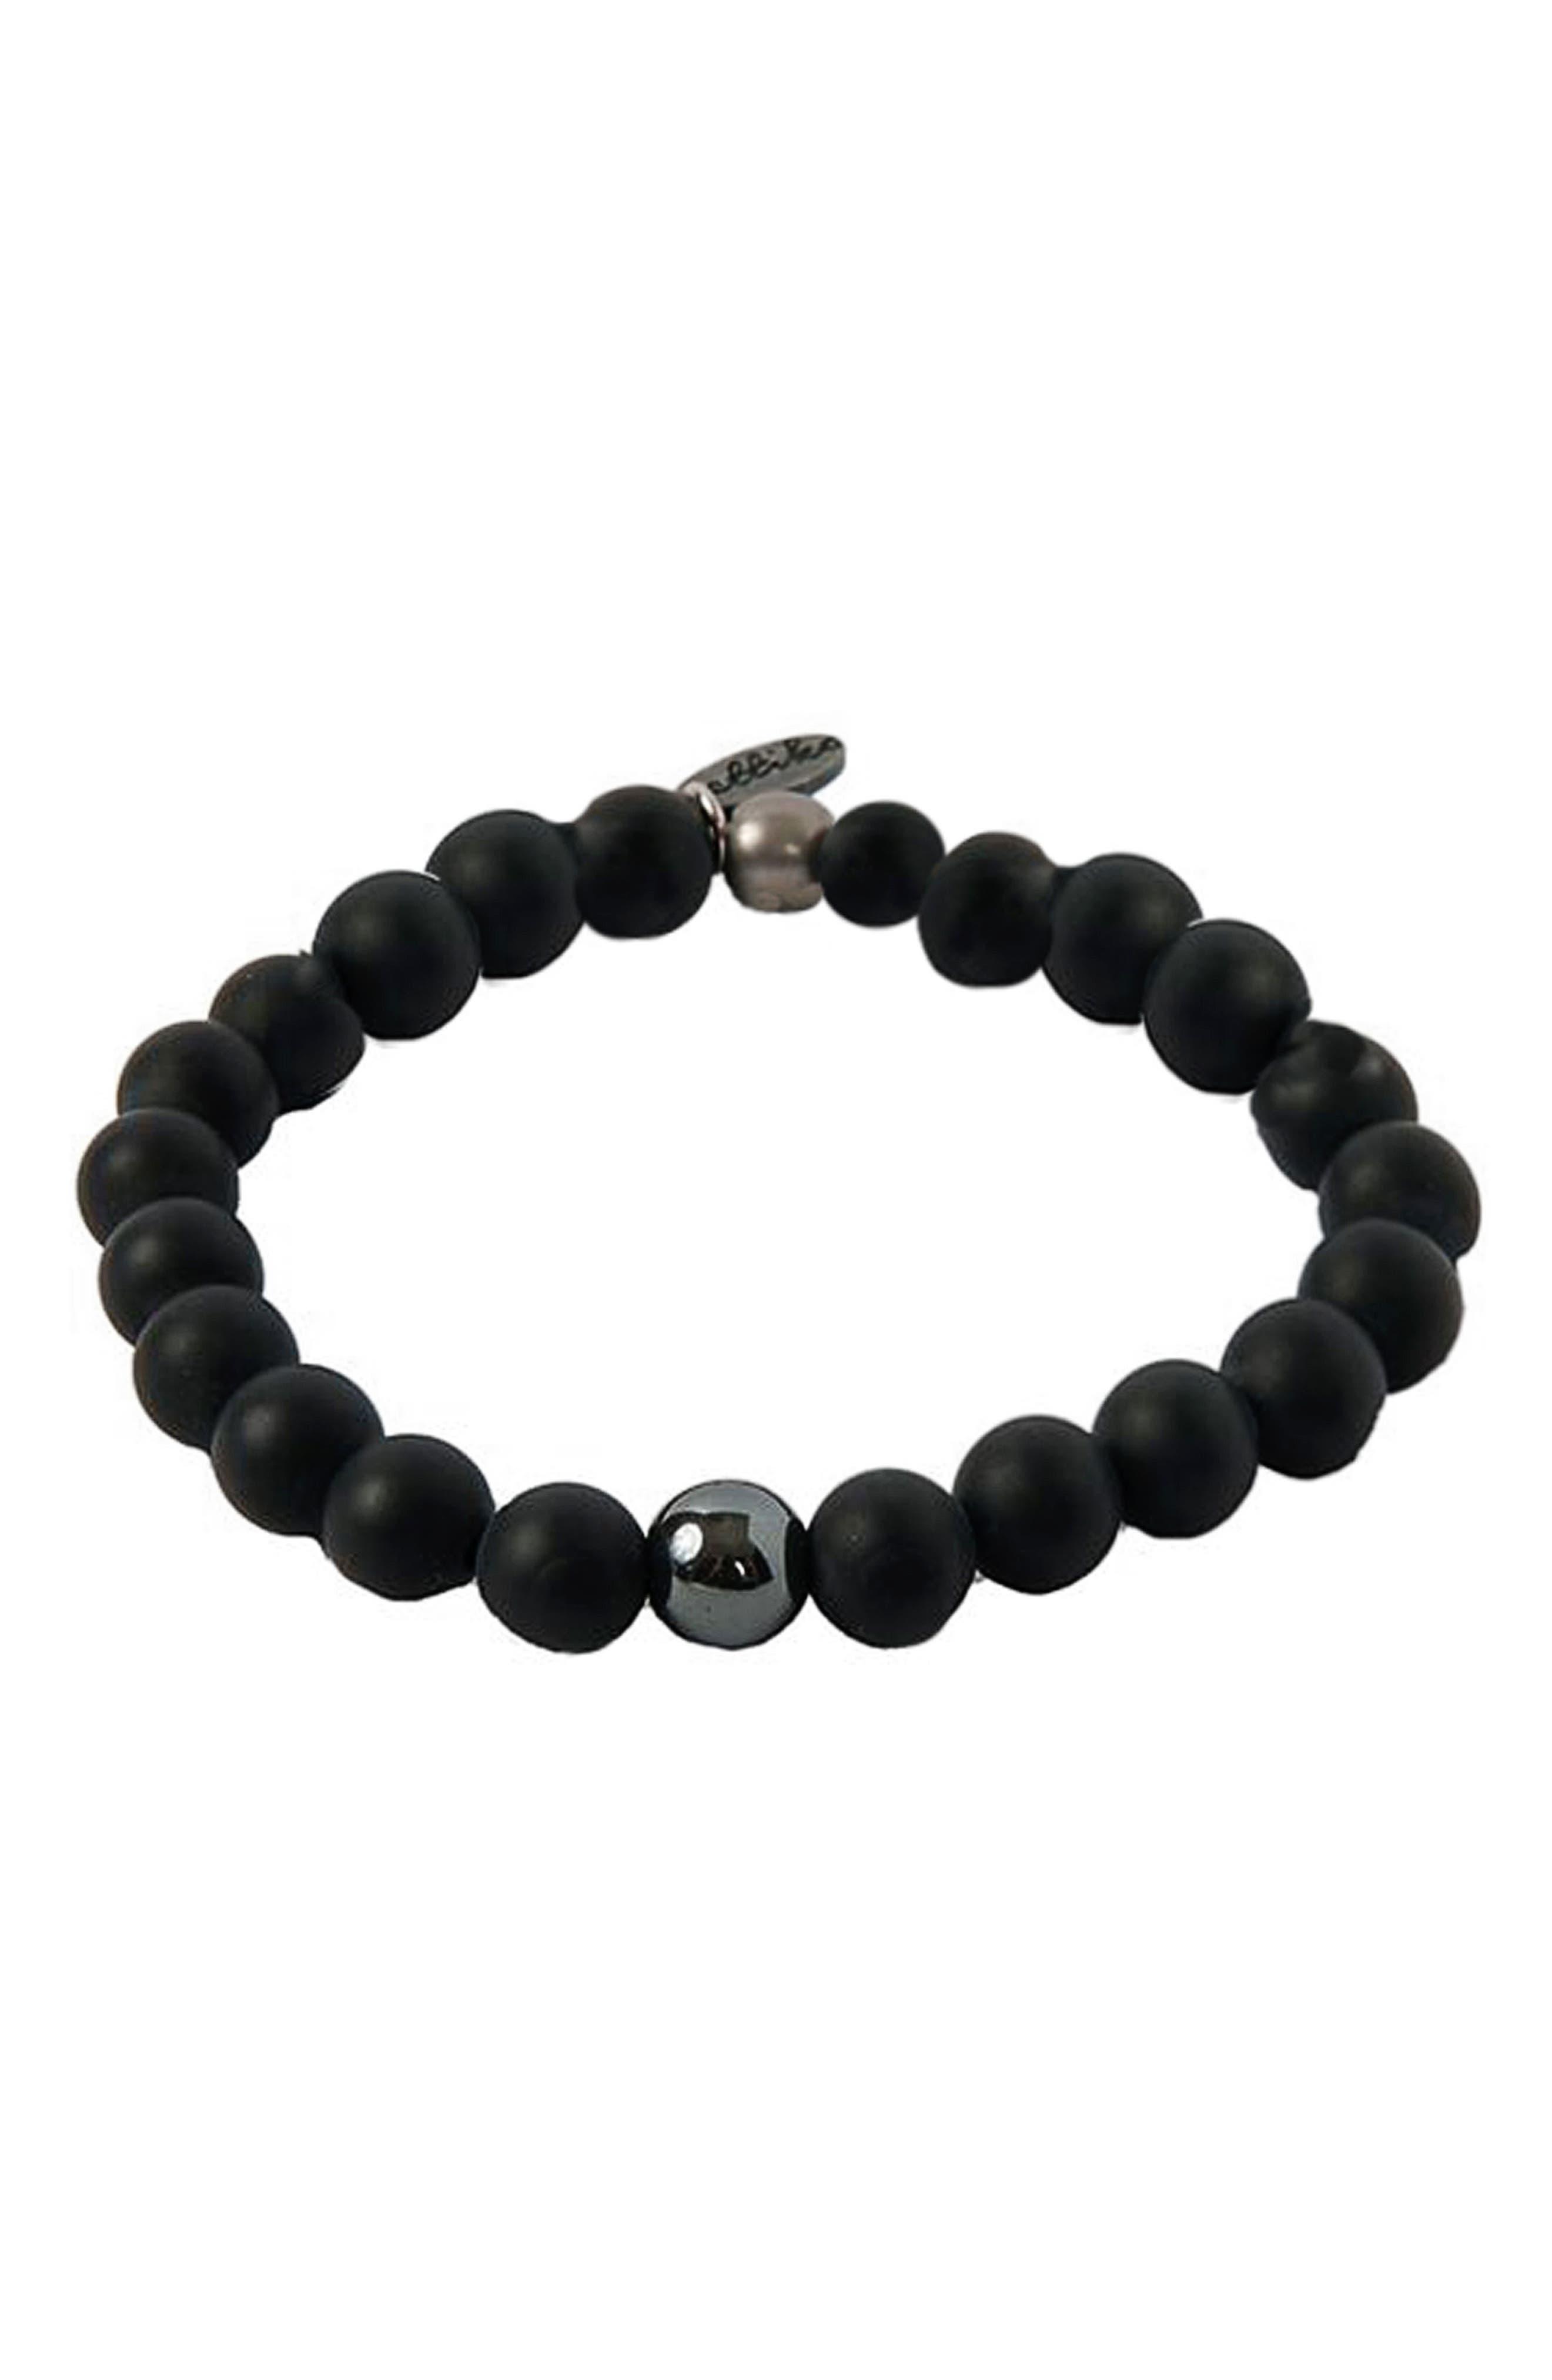 Hematite Onyx Bracelet,                             Main thumbnail 1, color,                             BLACK